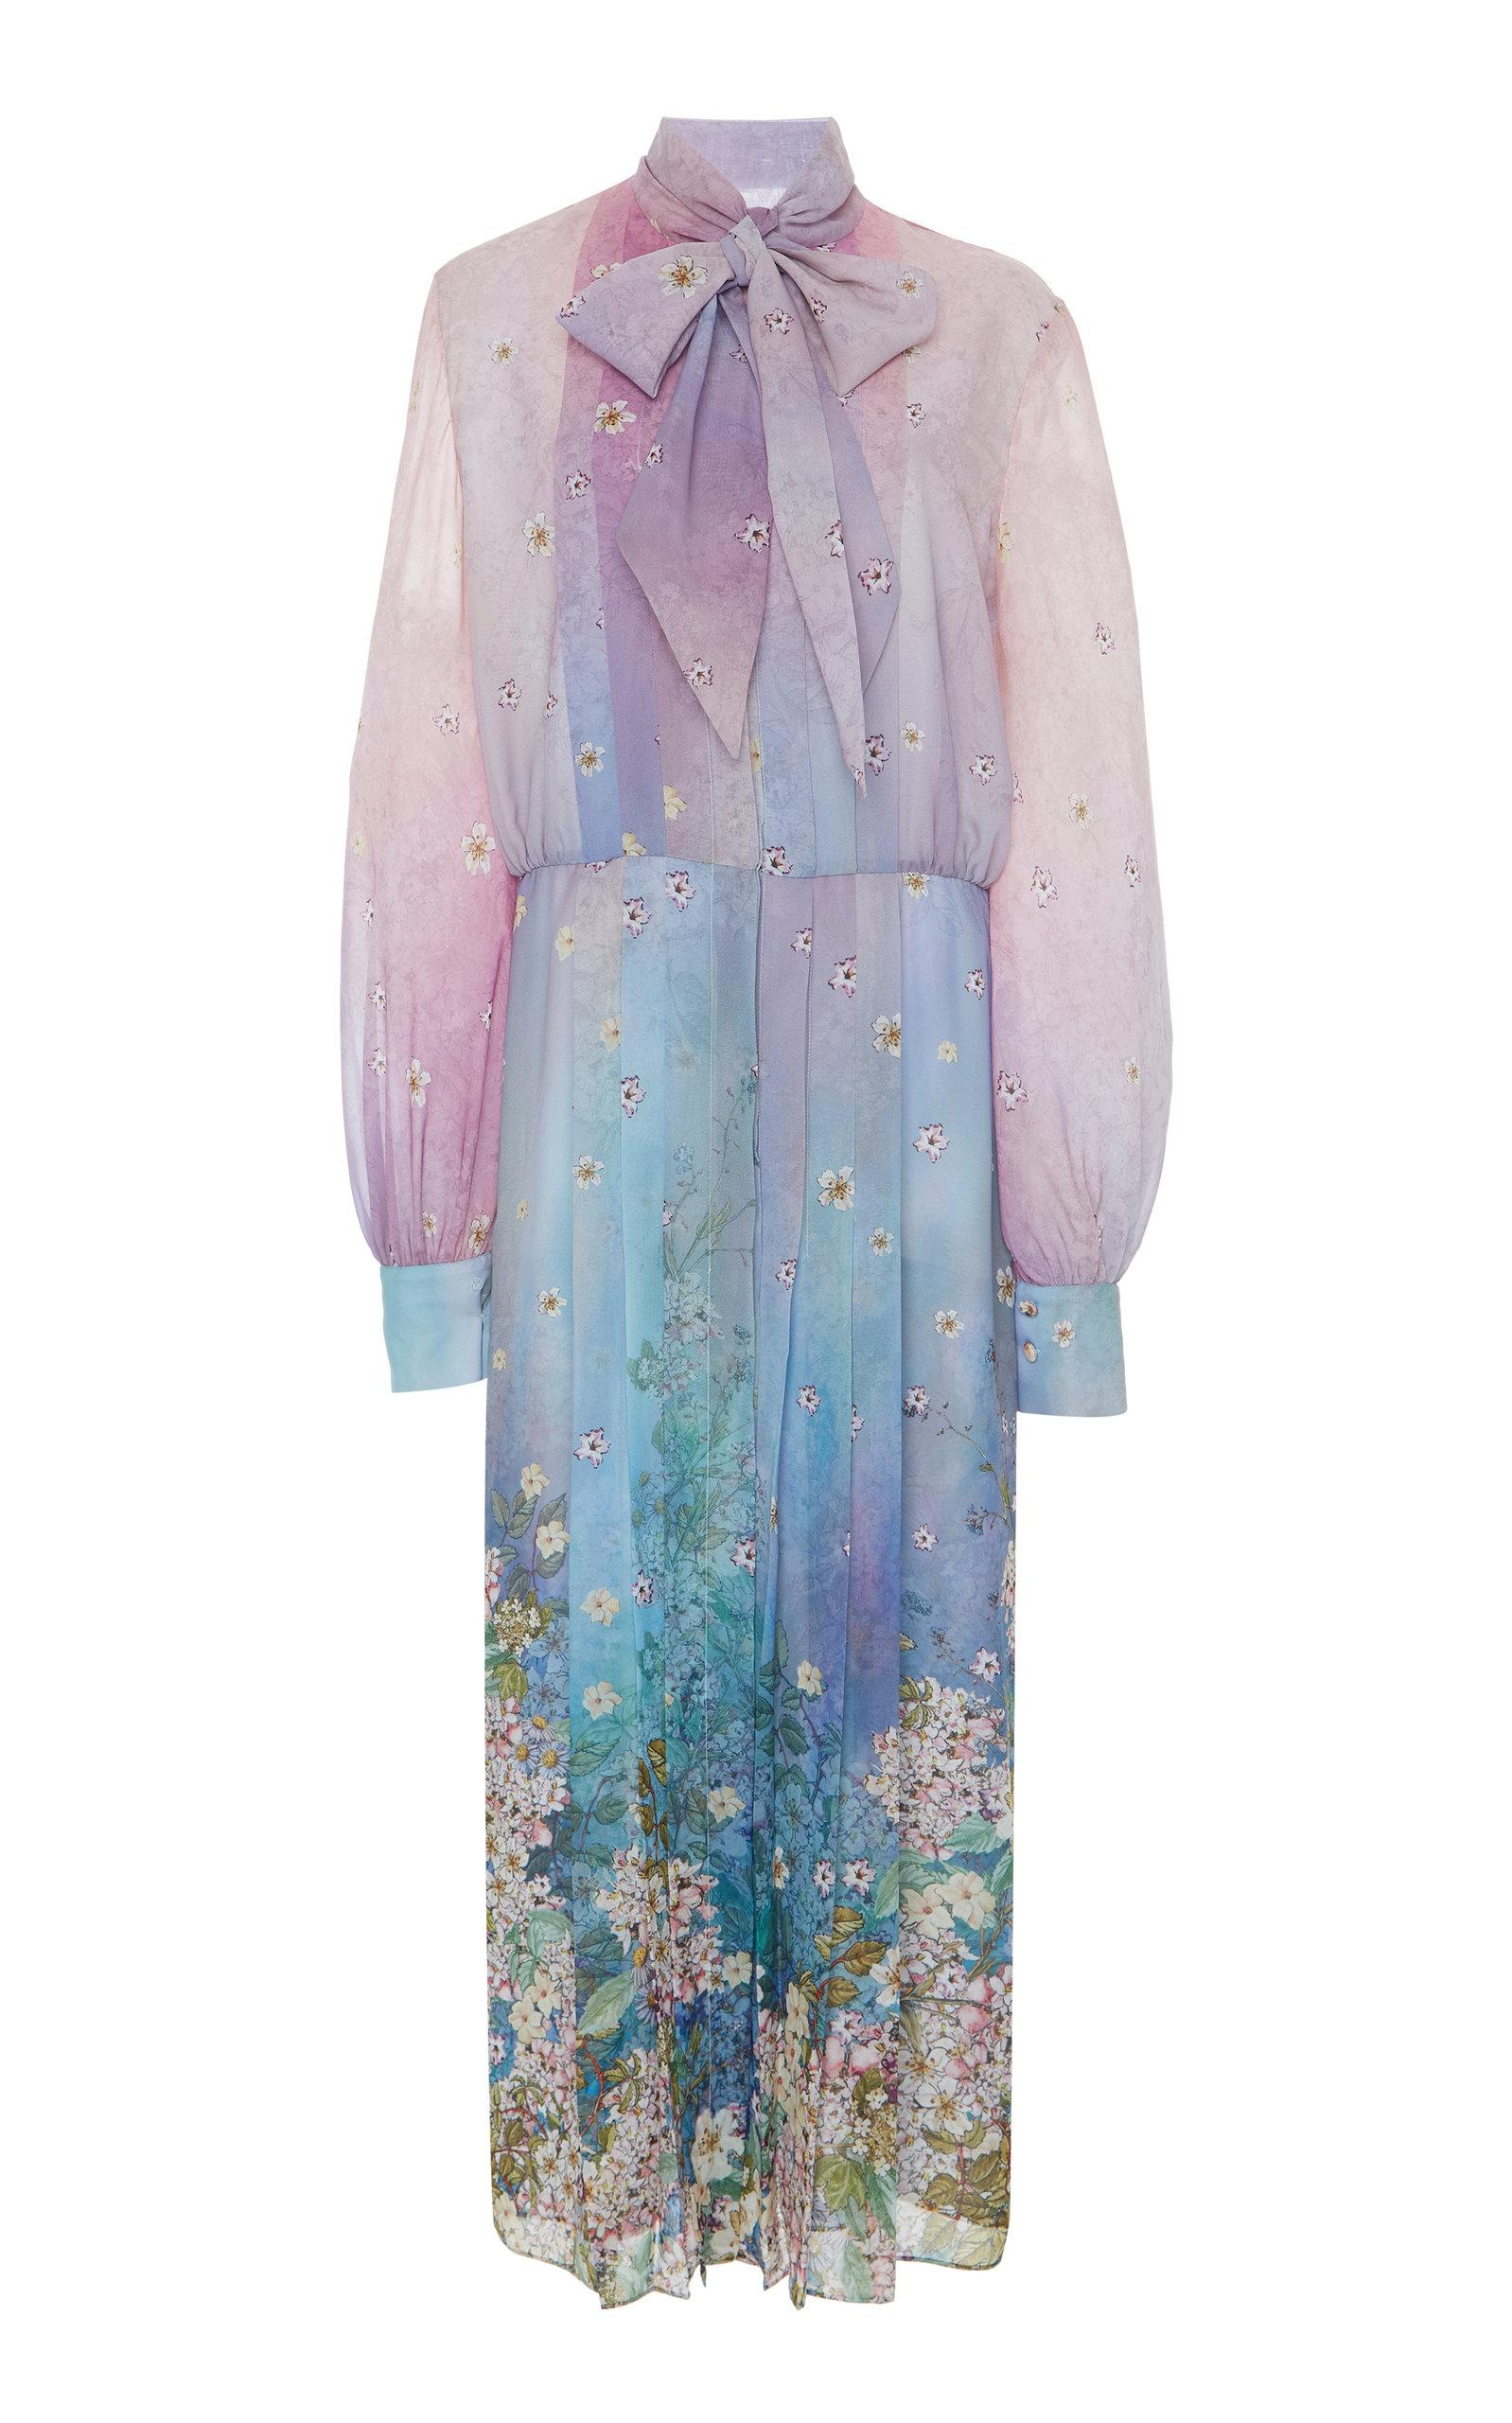 e961ade92f729 Floral Print Chiffon Dress by Luisa Beccaria | Moda Operandi